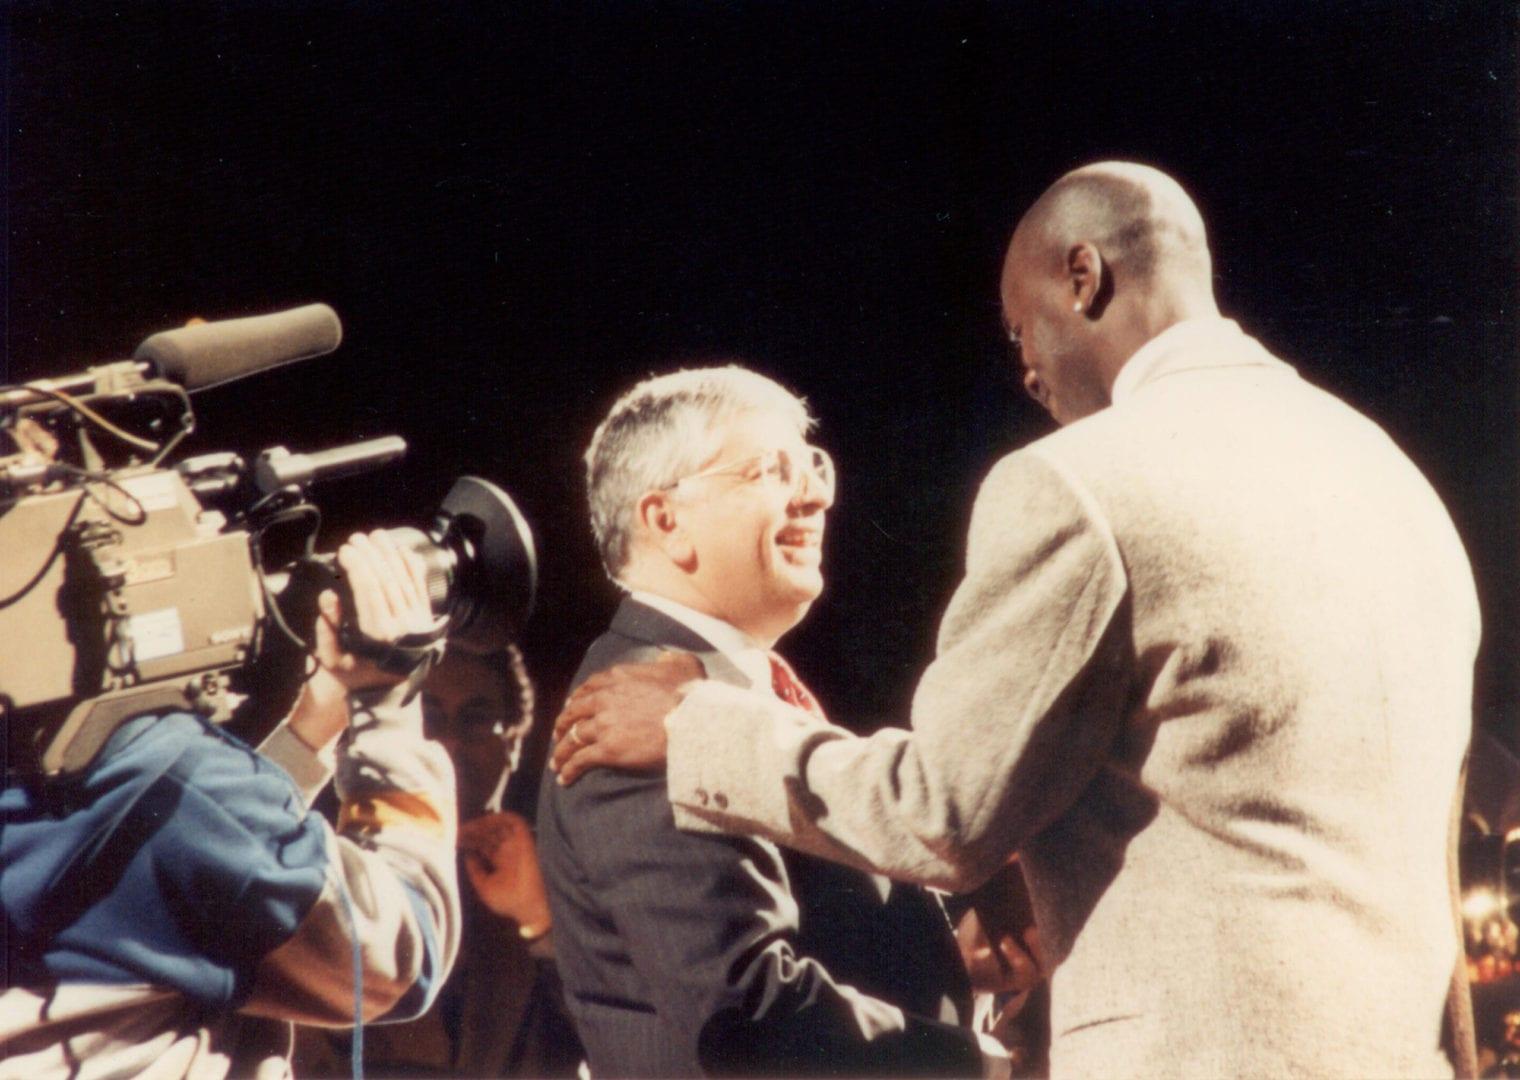 David Stern greeting Michael Jordan